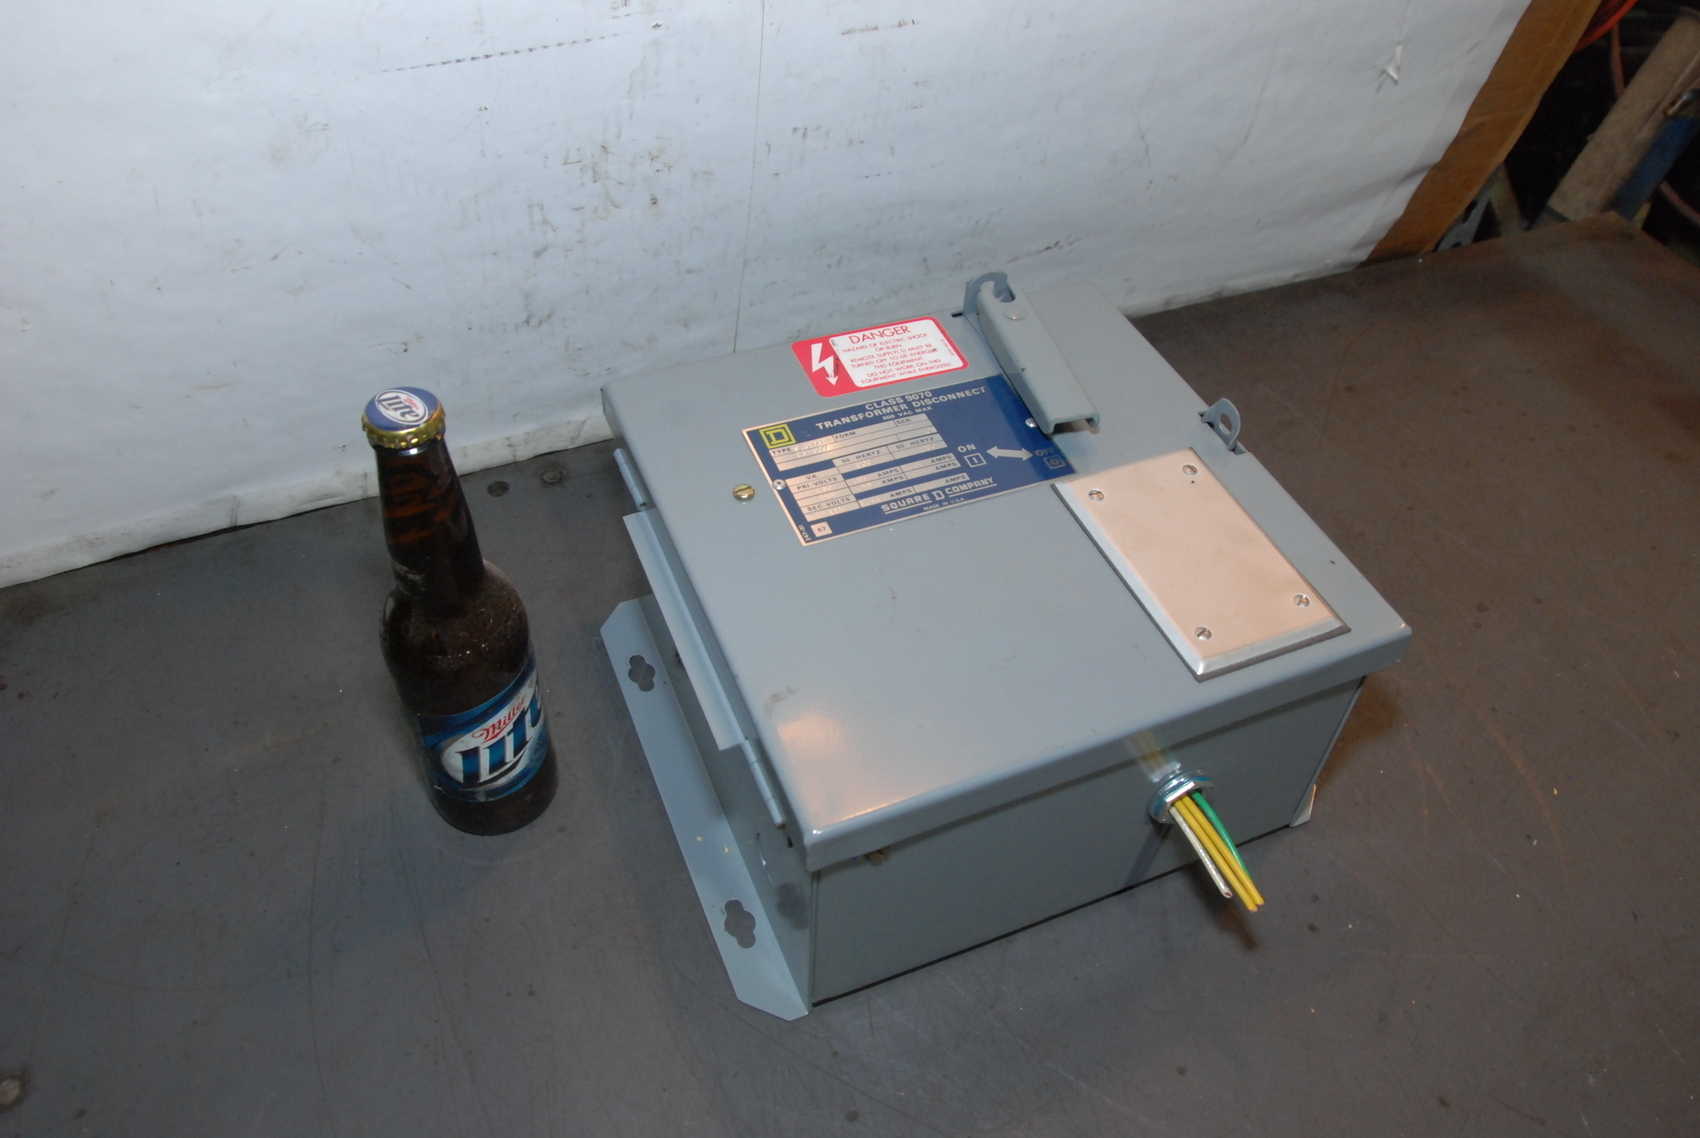 Square D SK5271R Transformer Disconnect 230/460V Sec 115V